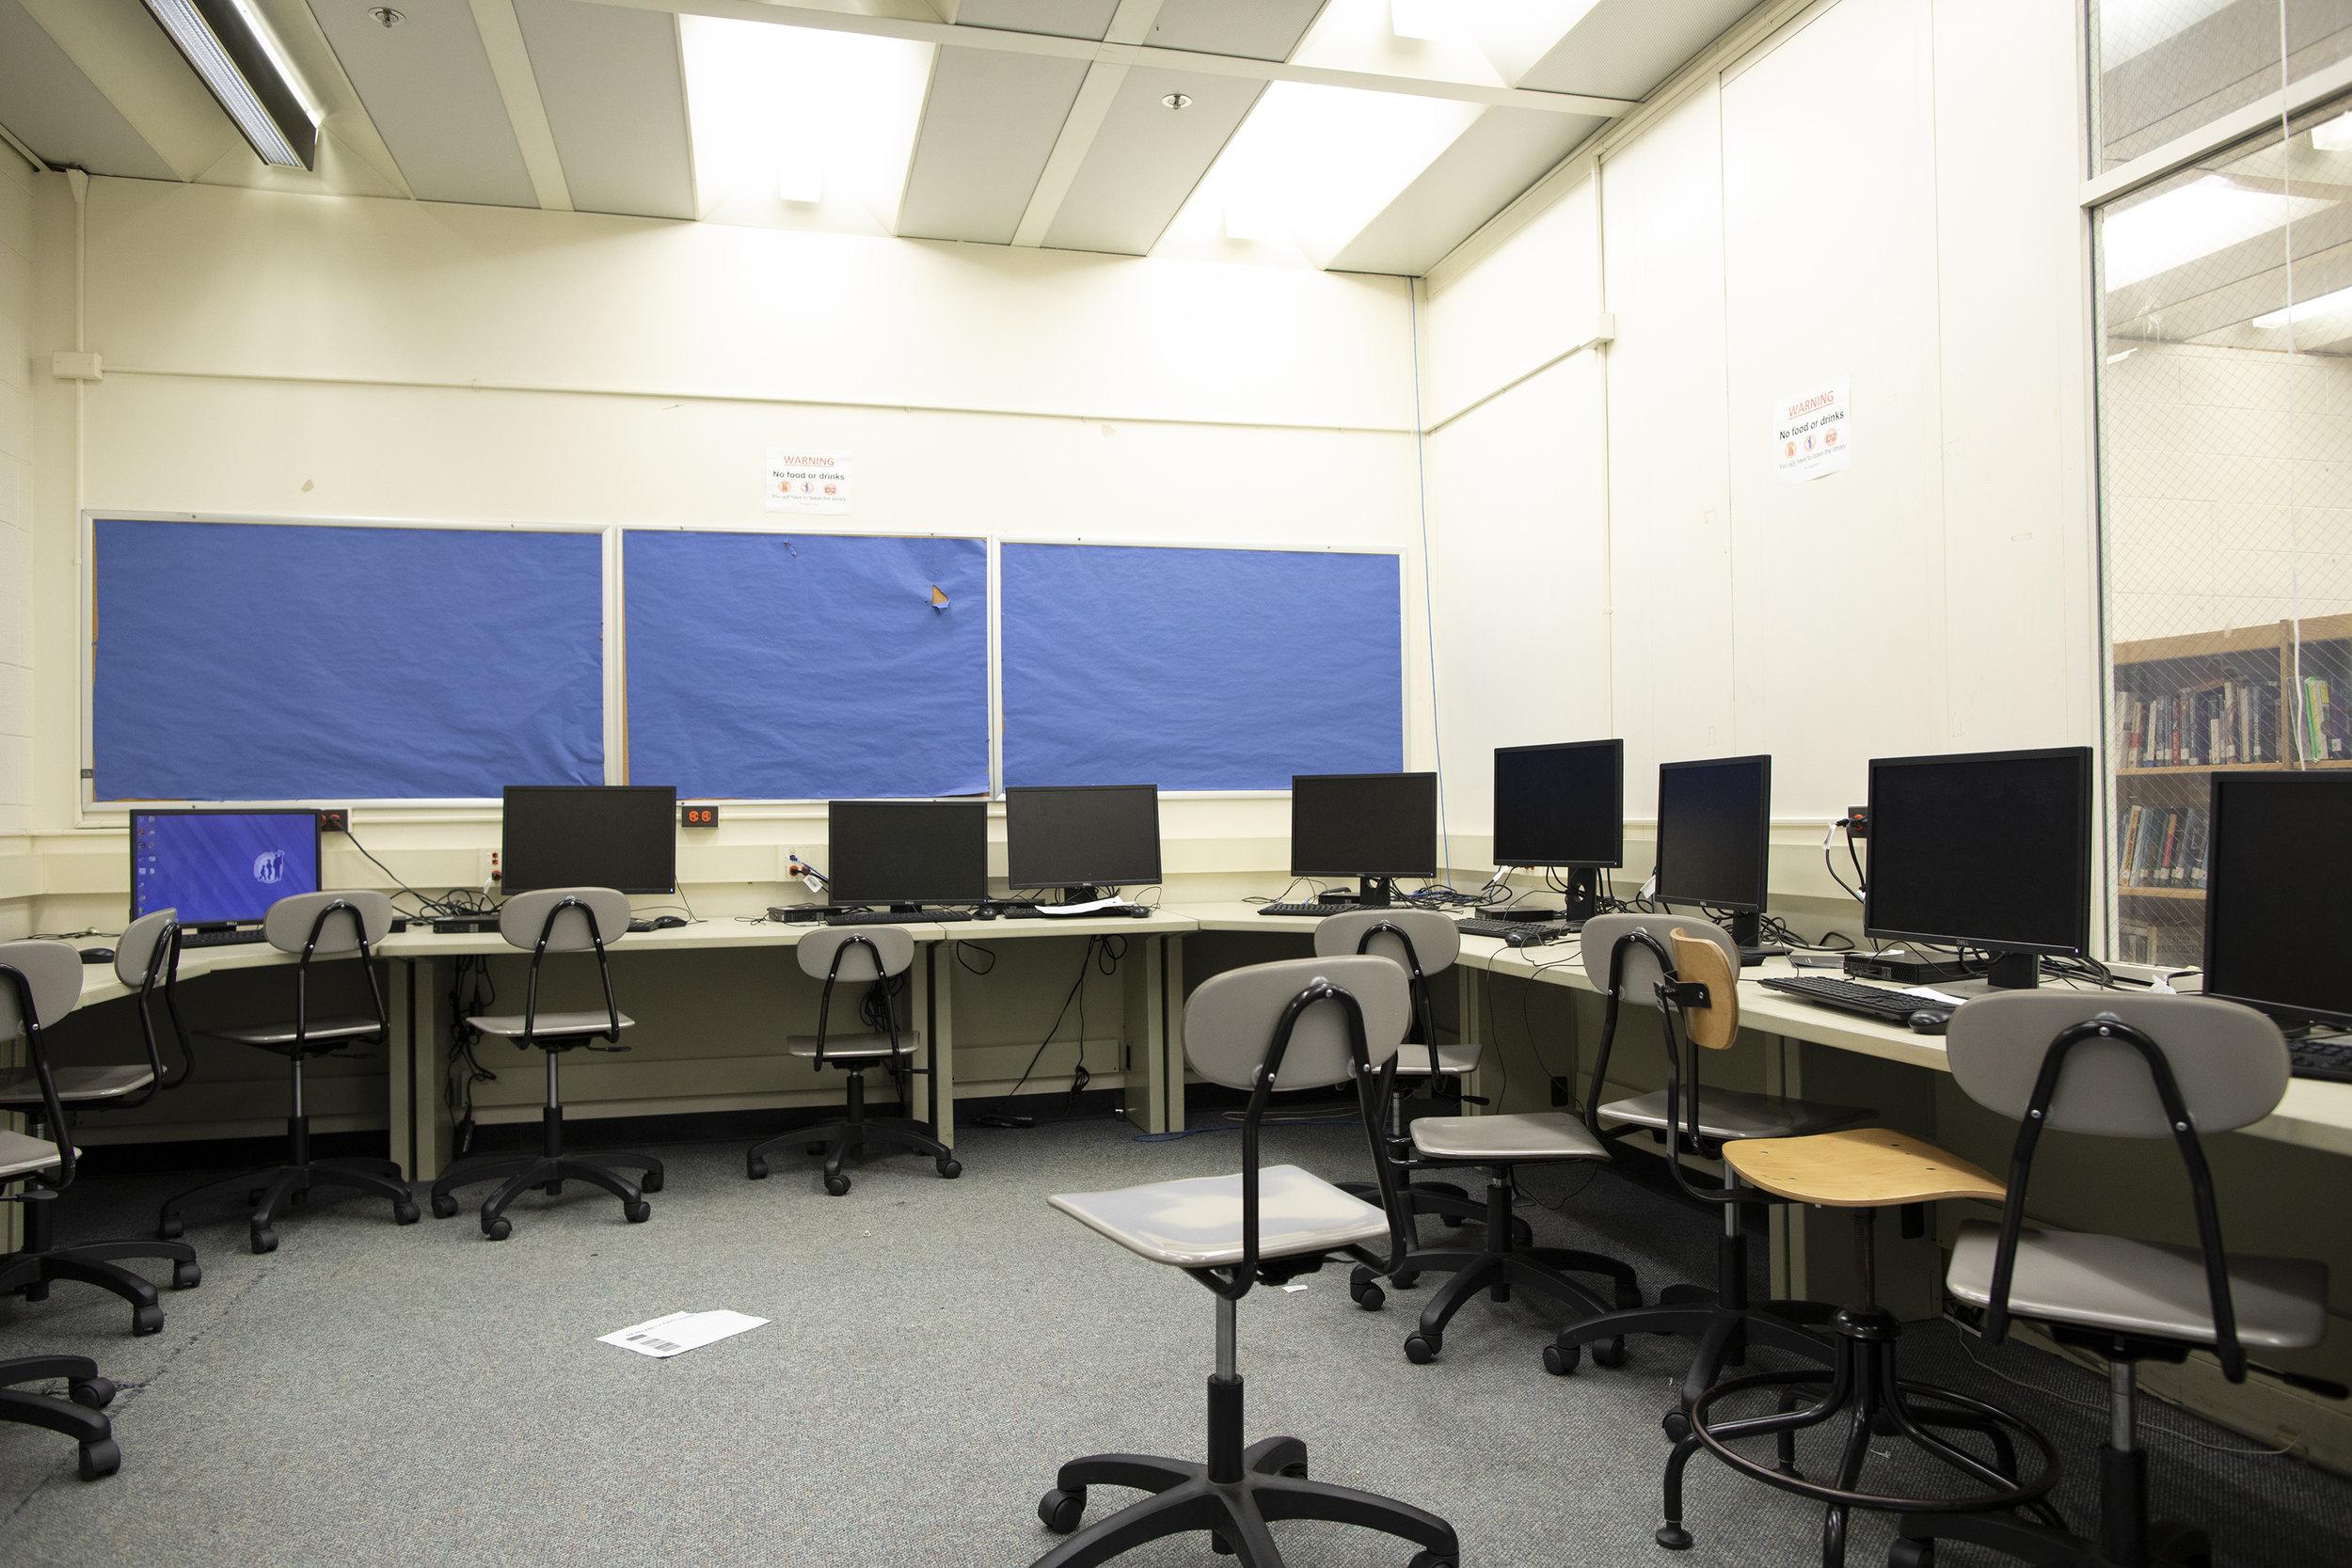 Lift Life_Michele Clark Chicago_Trip 1_Computer Lab 0007.jpg